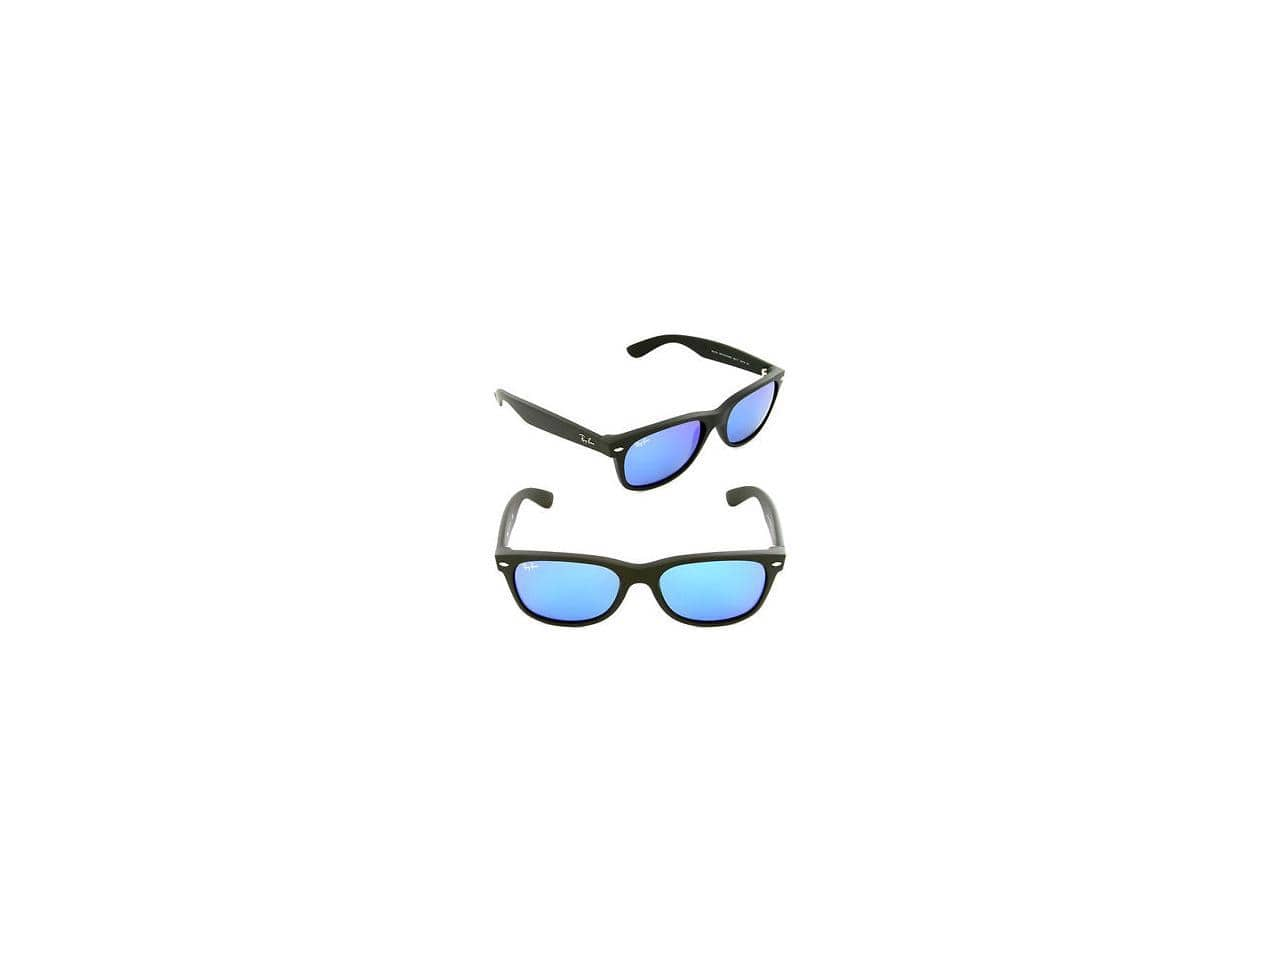 Ray Ban New Wayfarer Flash Sunglasses (55mm) RB2132 for $64.99 + FS